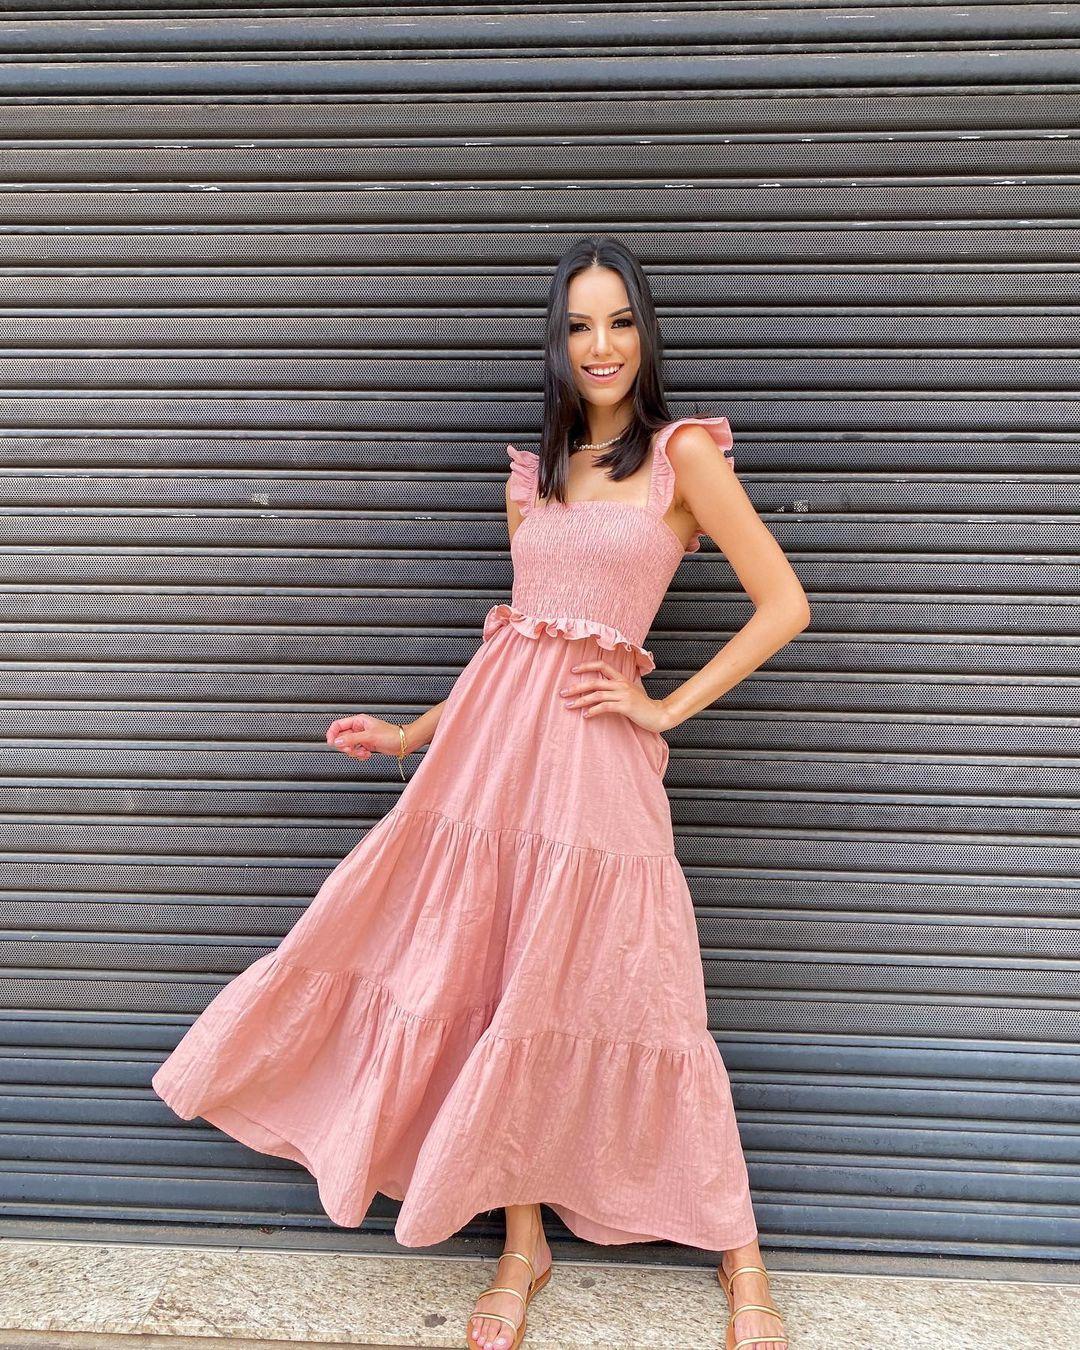 rafaella felipe, top 20 de miss brasil mundo 2019. Qlqcyv10